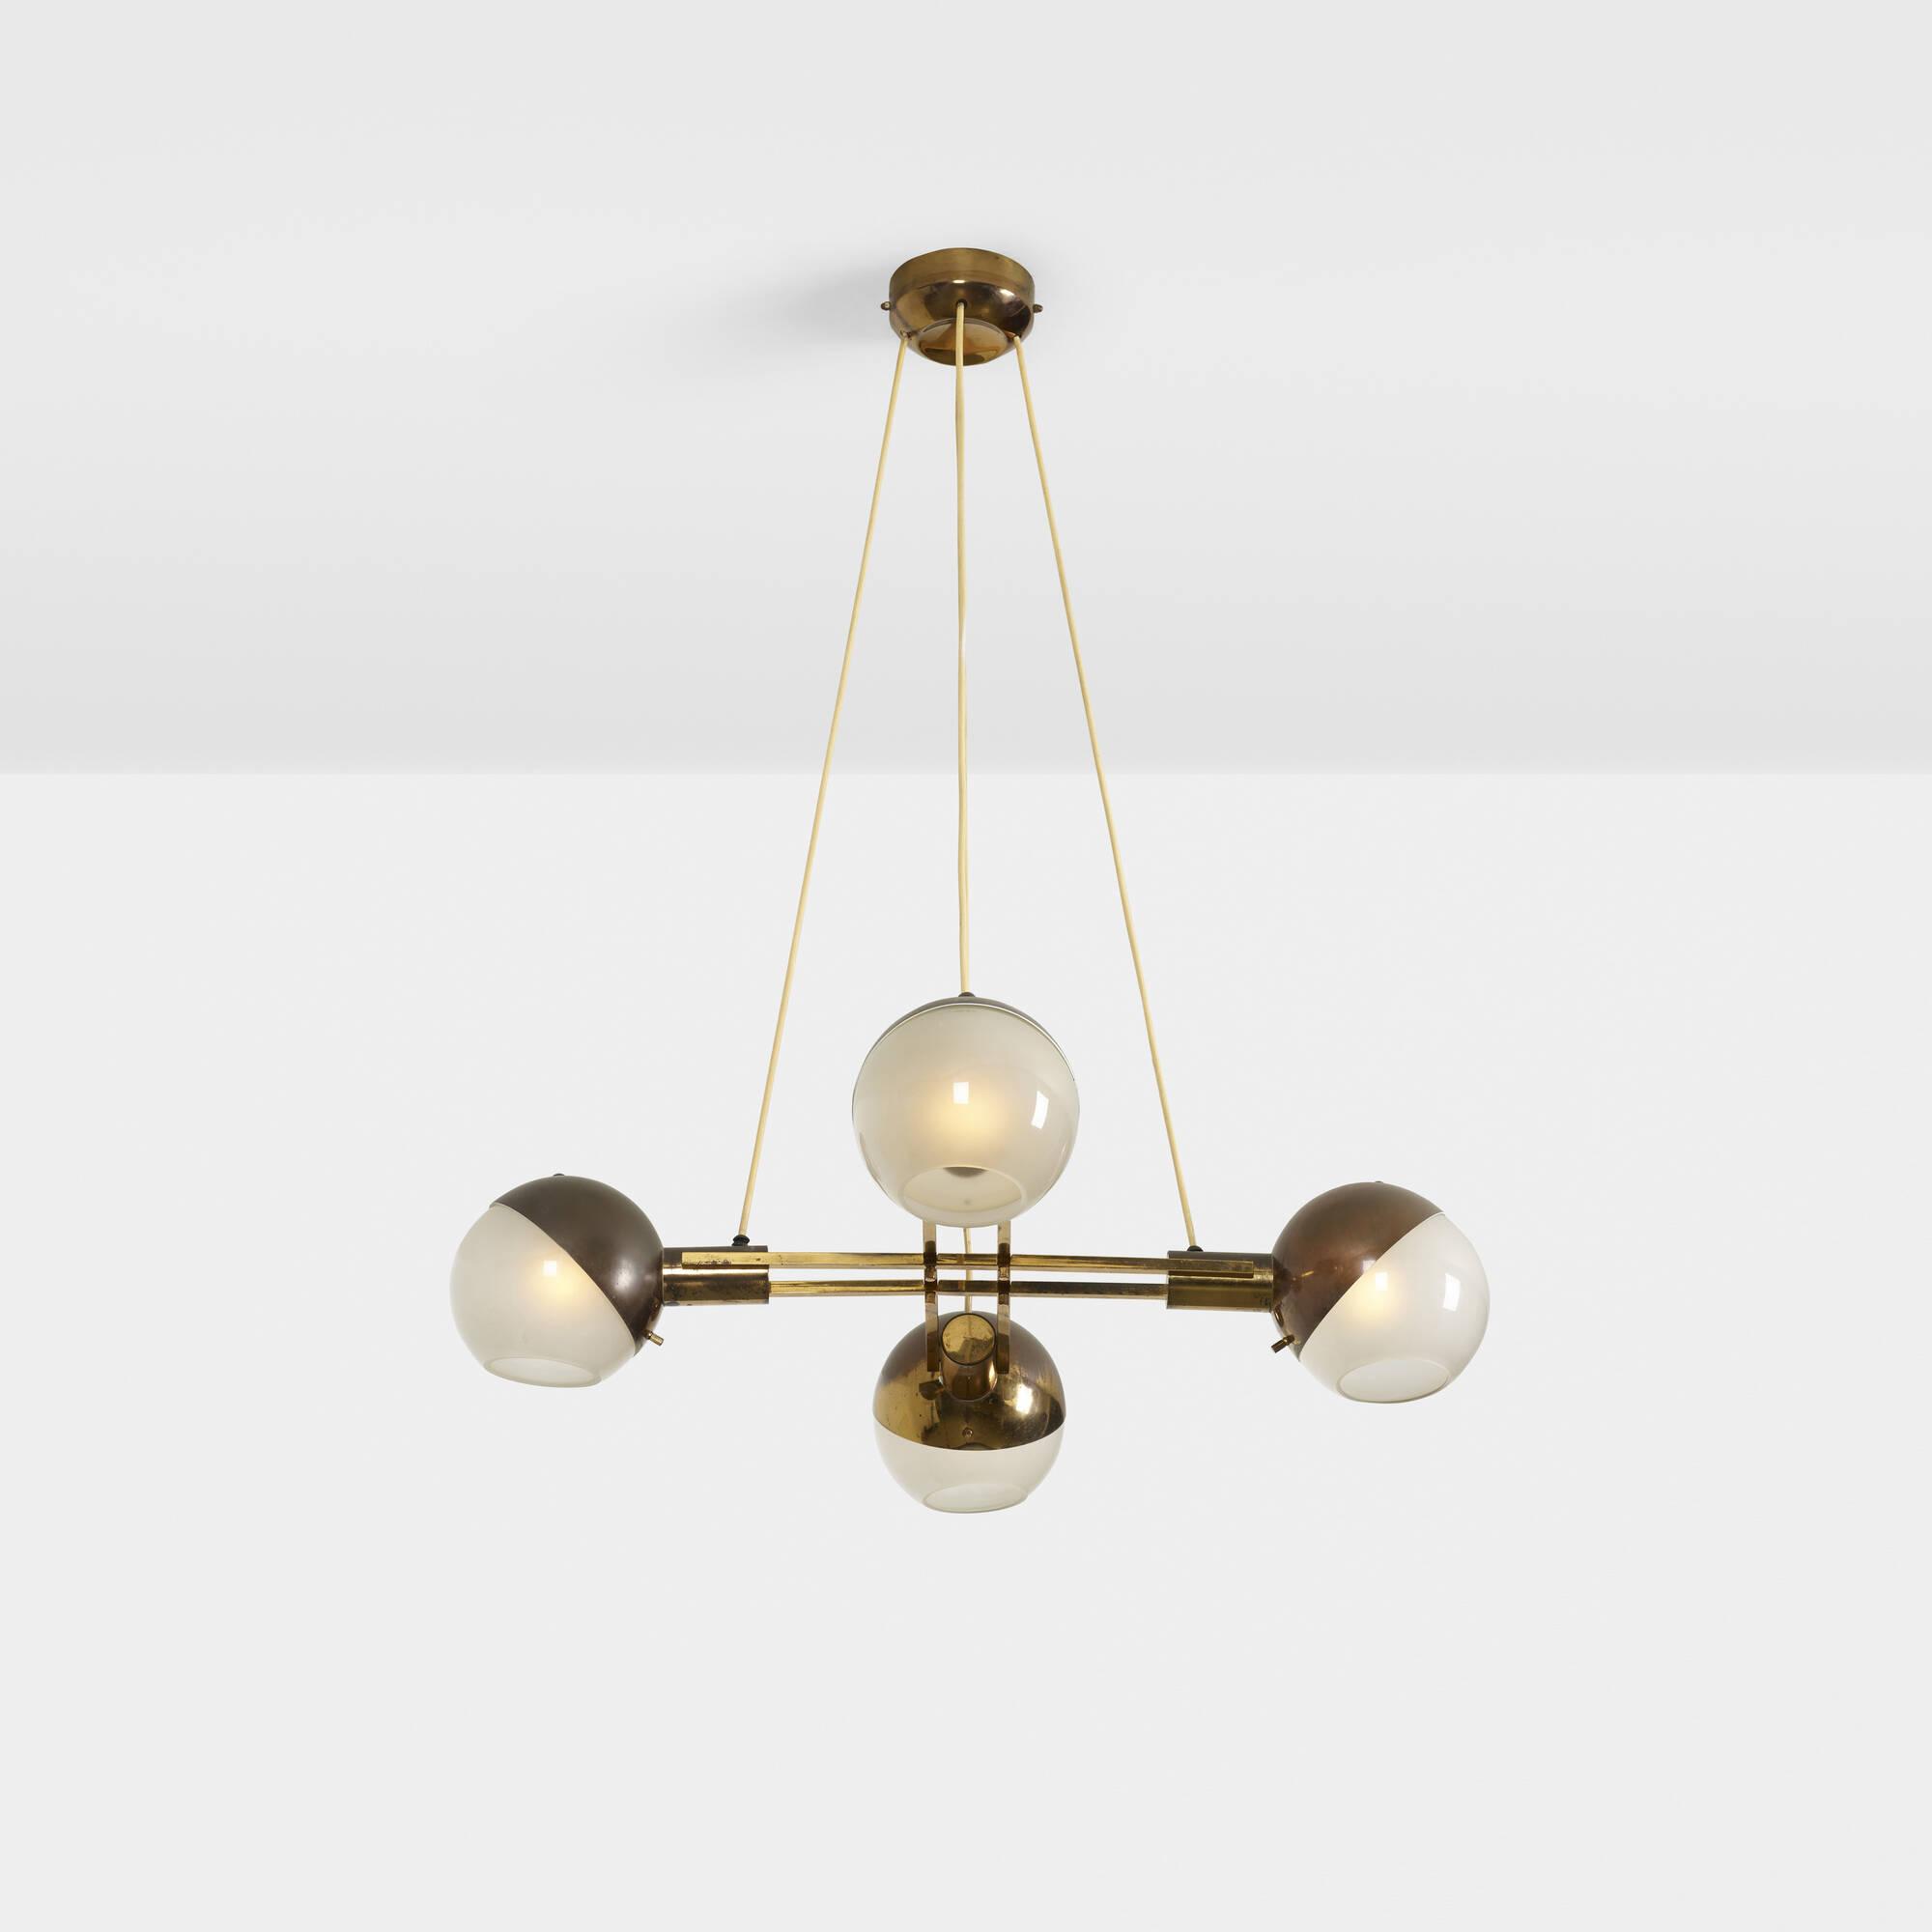 272 stilnovo chandelier design 22 march 2018 auctions 272 stilnovo chandelier 1 of 2 aloadofball Gallery